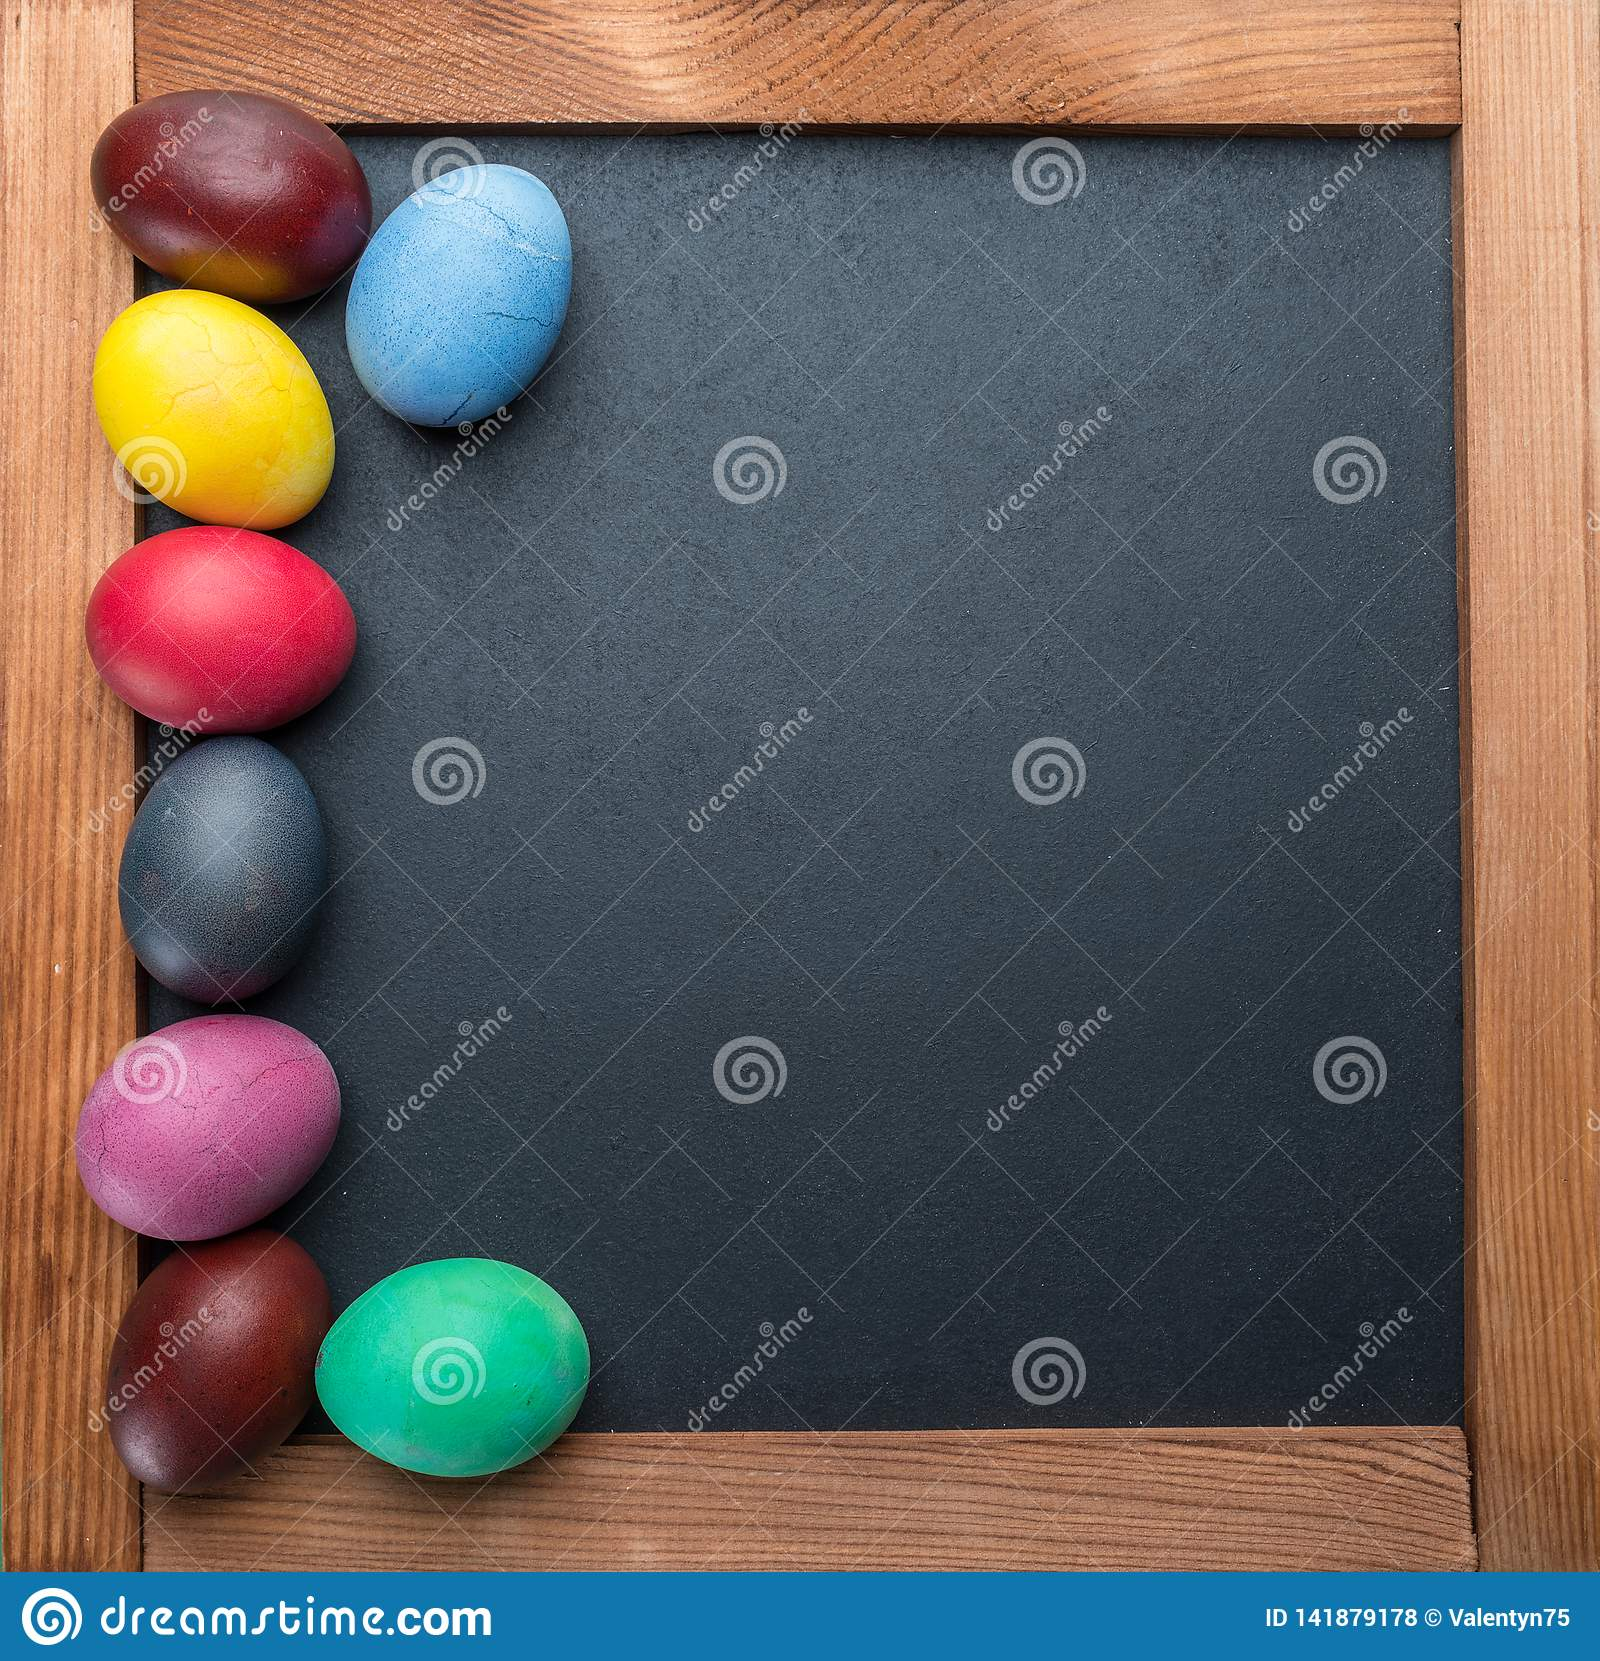 Blackboard i kolorowi Wielkanocni jajka na nim na widok